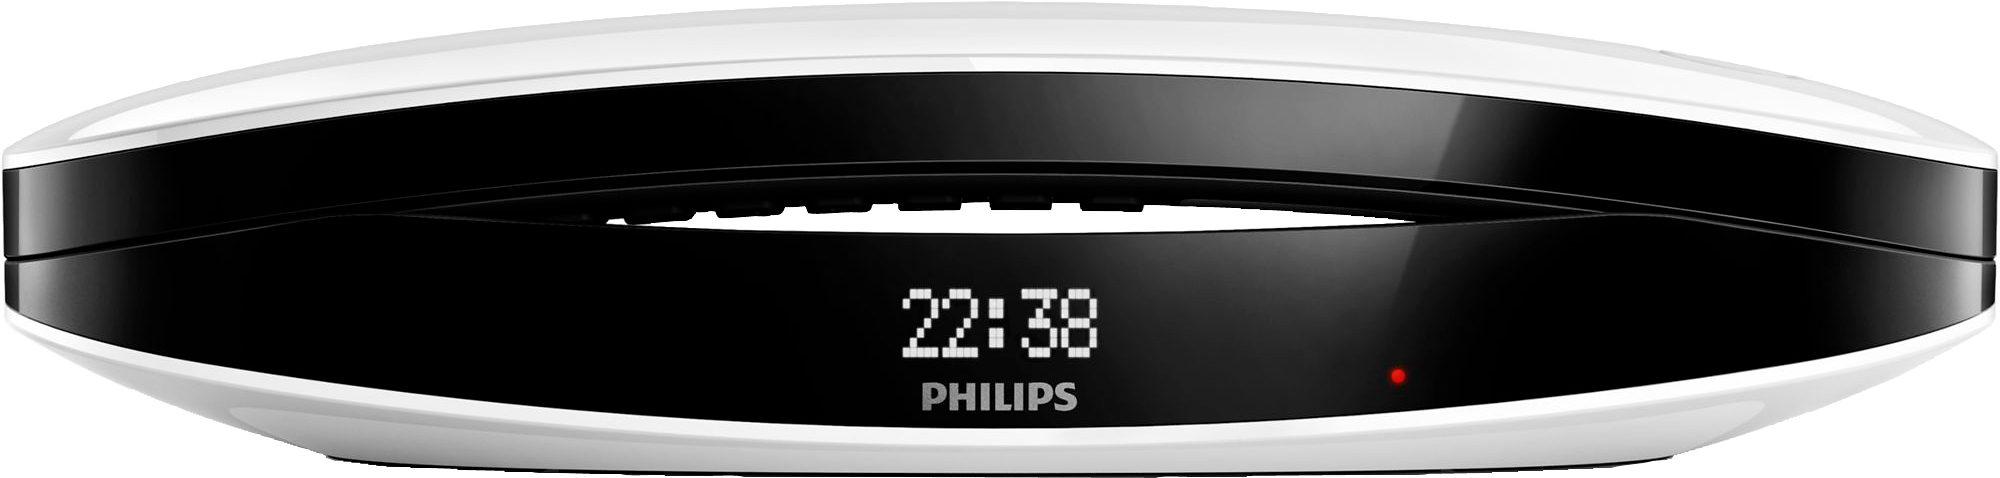 Philips M6652WB/38 Schnurloses DECT Telefon mit AB